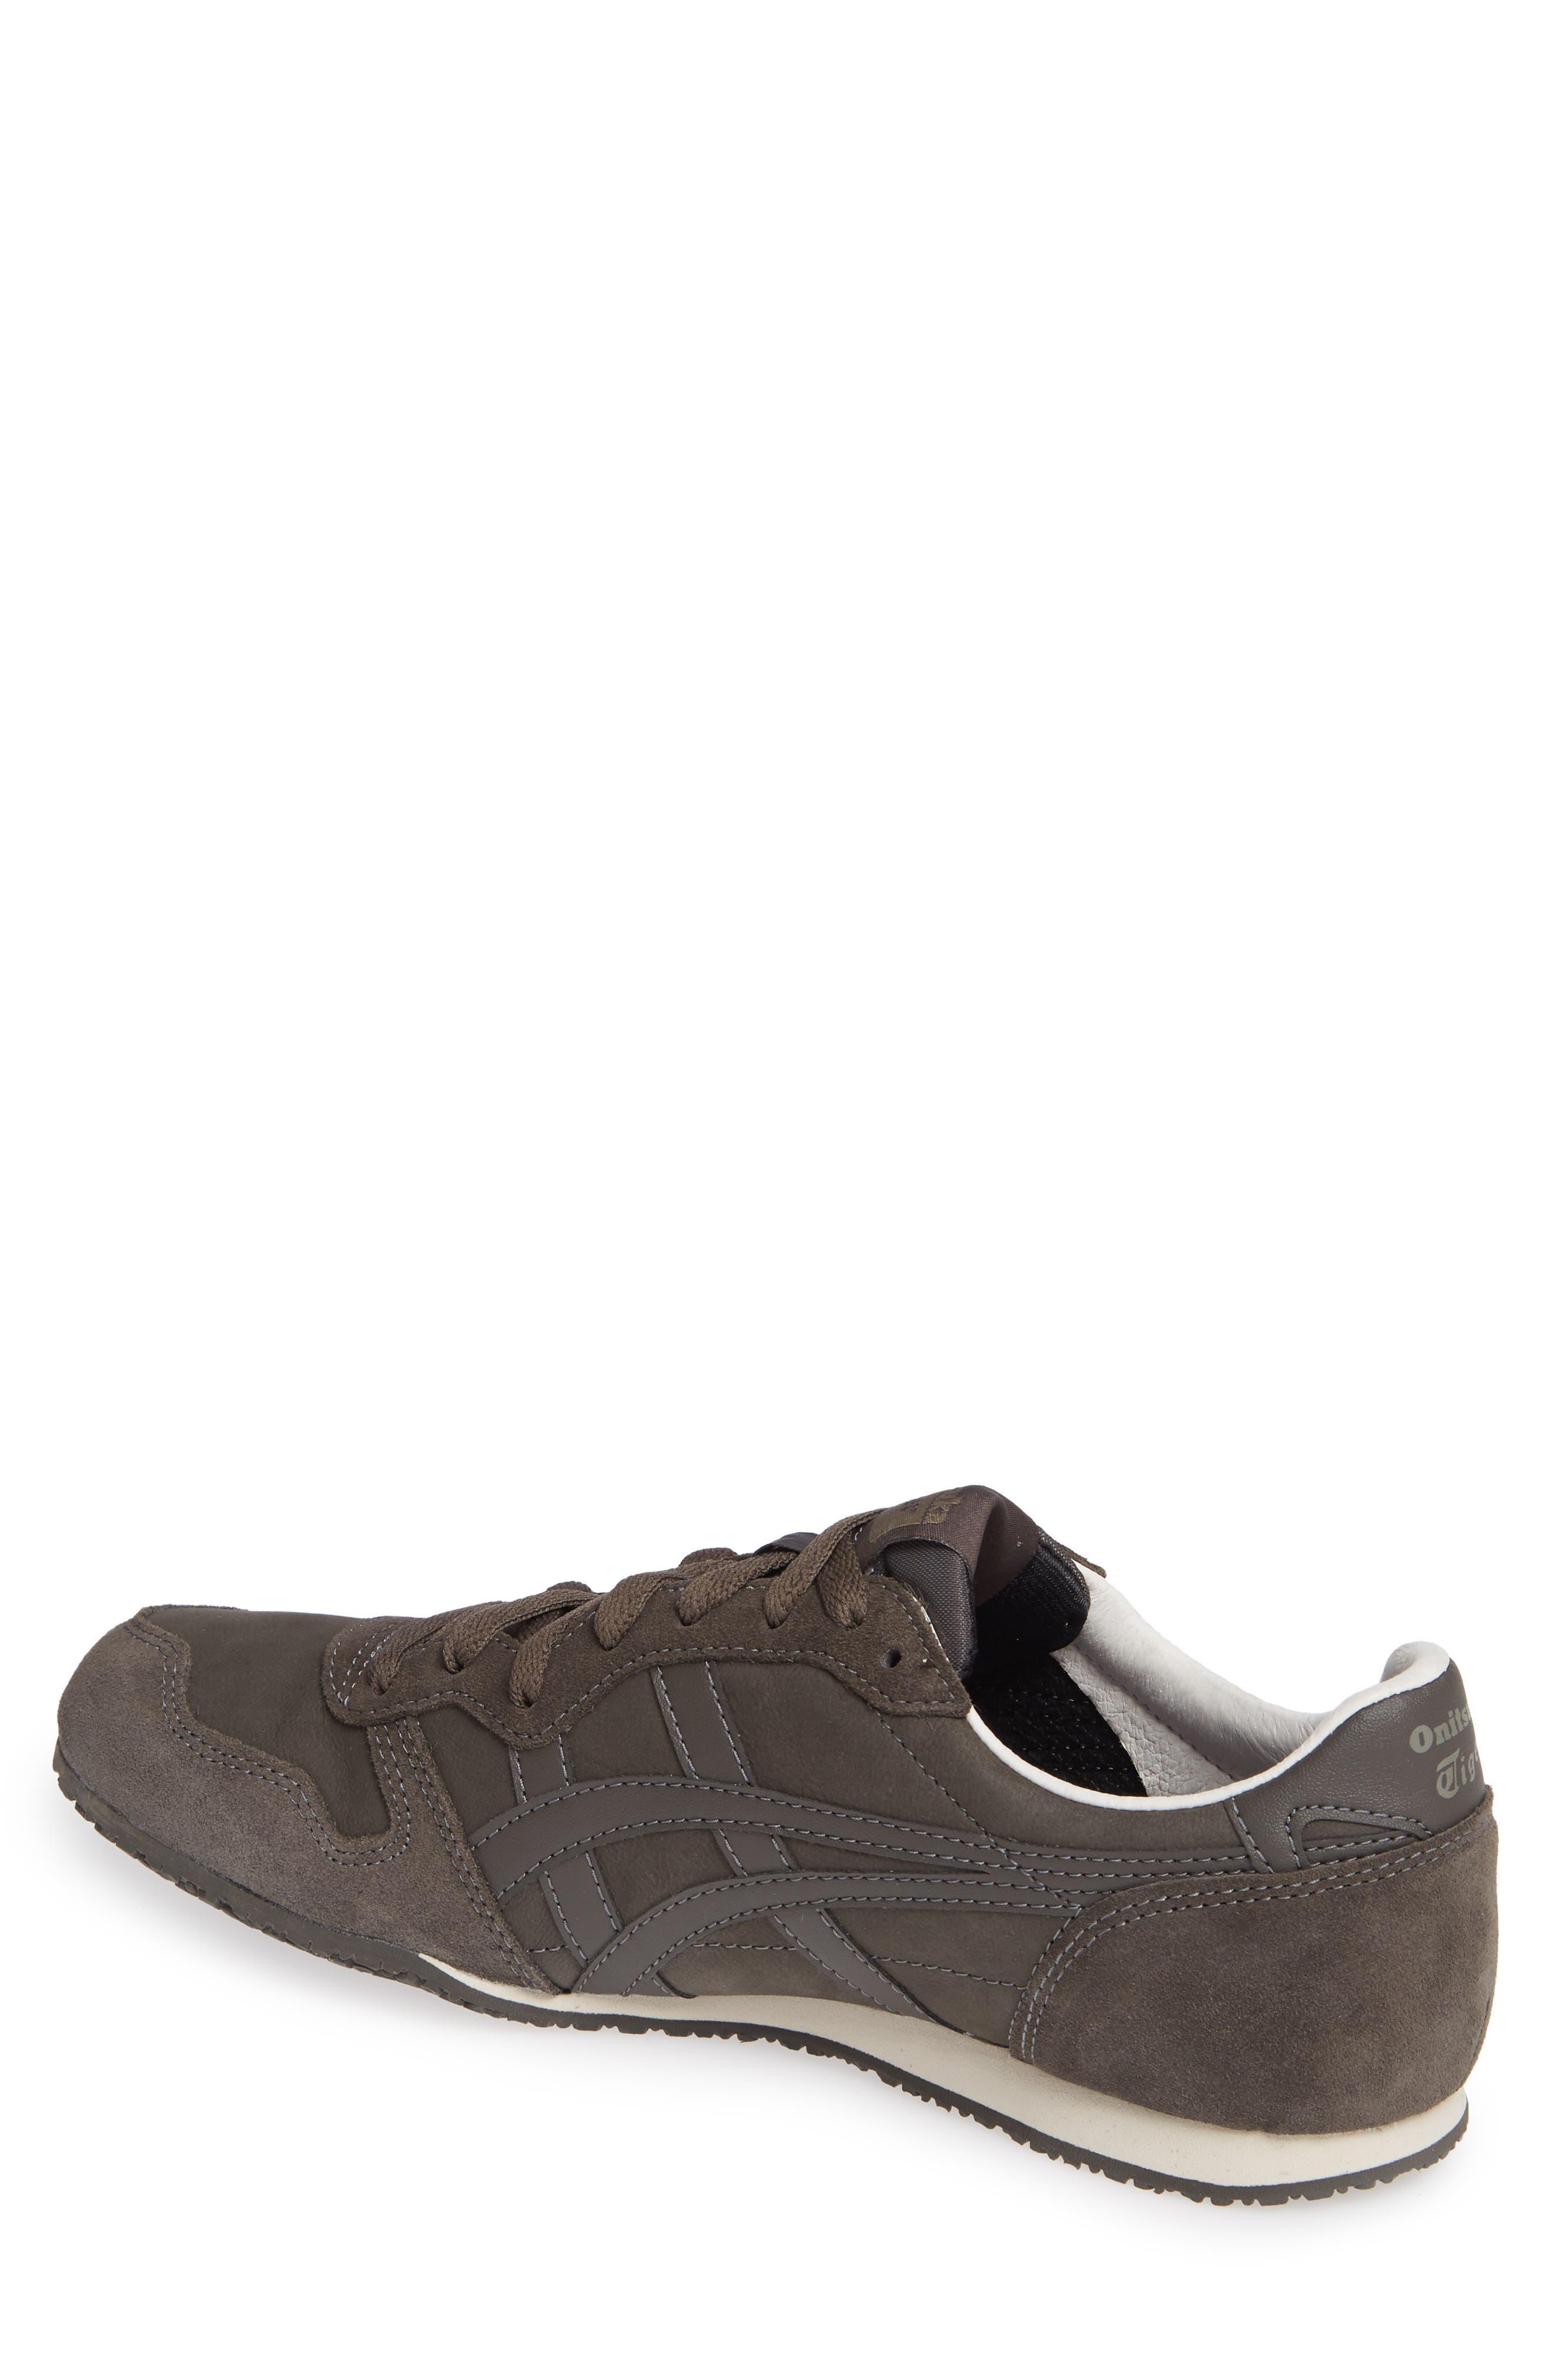 'Serrano' Sneaker,                             Alternate thumbnail 2, color,                             035